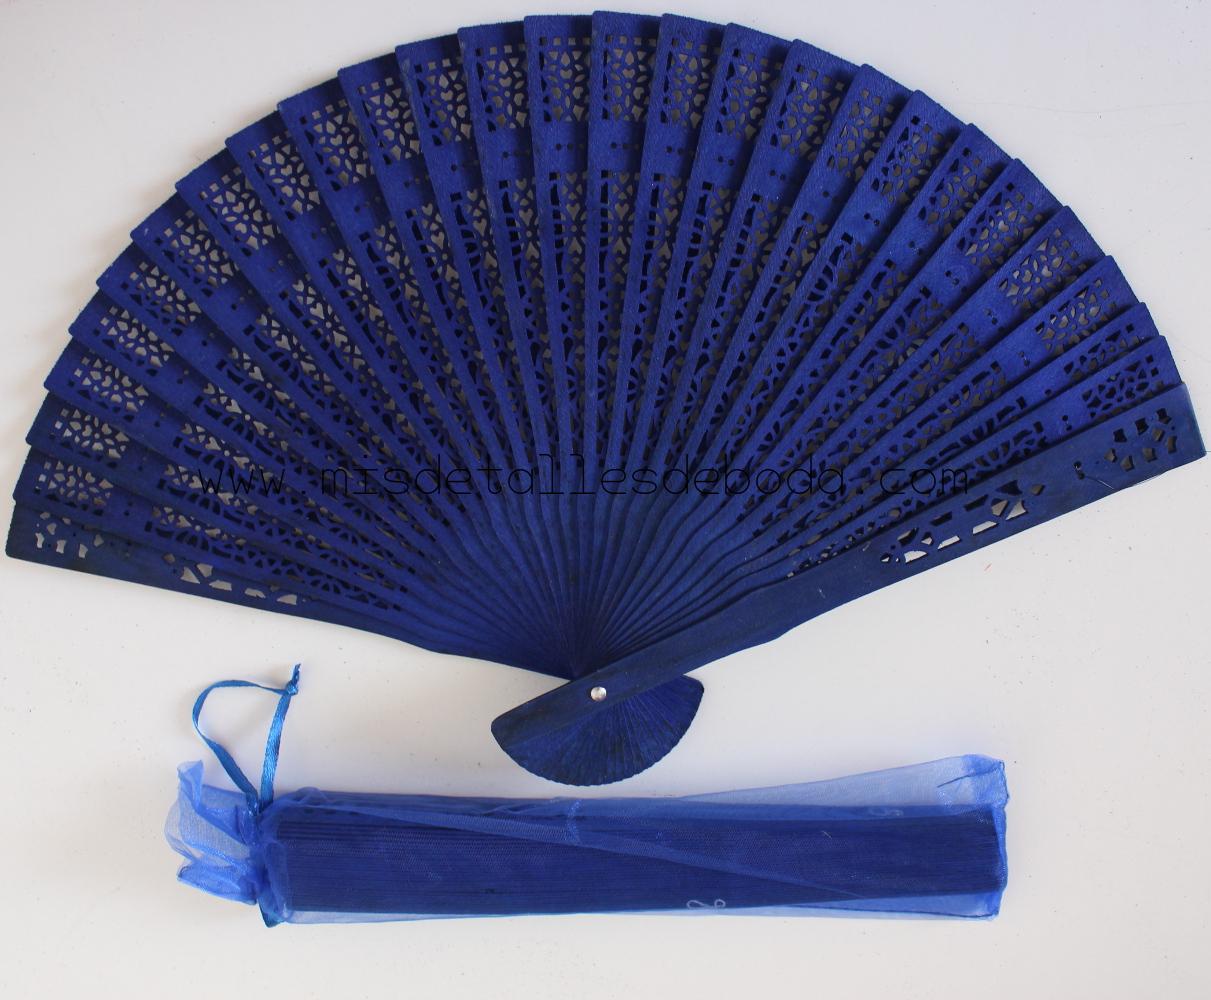 abanico-sandalo-azul-boda-recuerdo-comunion